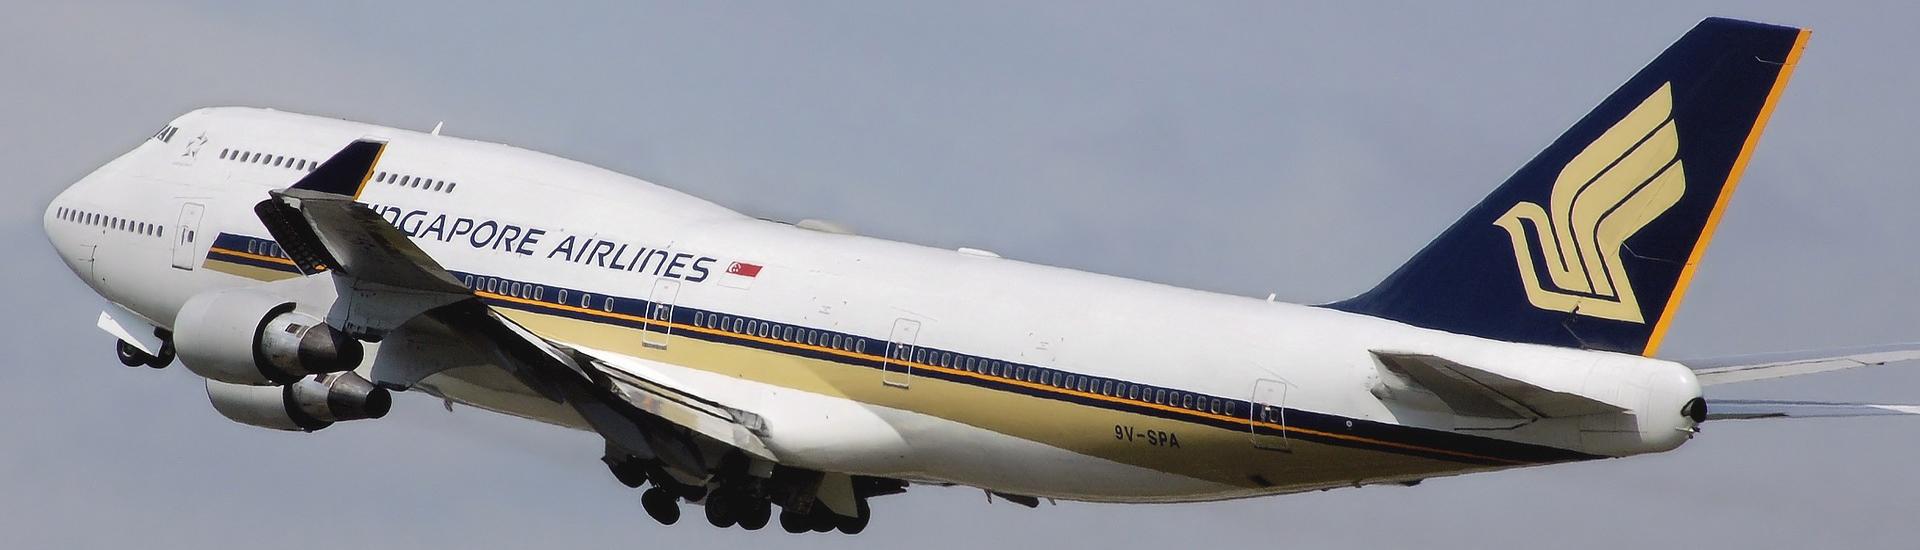 MR Singapore Airlines